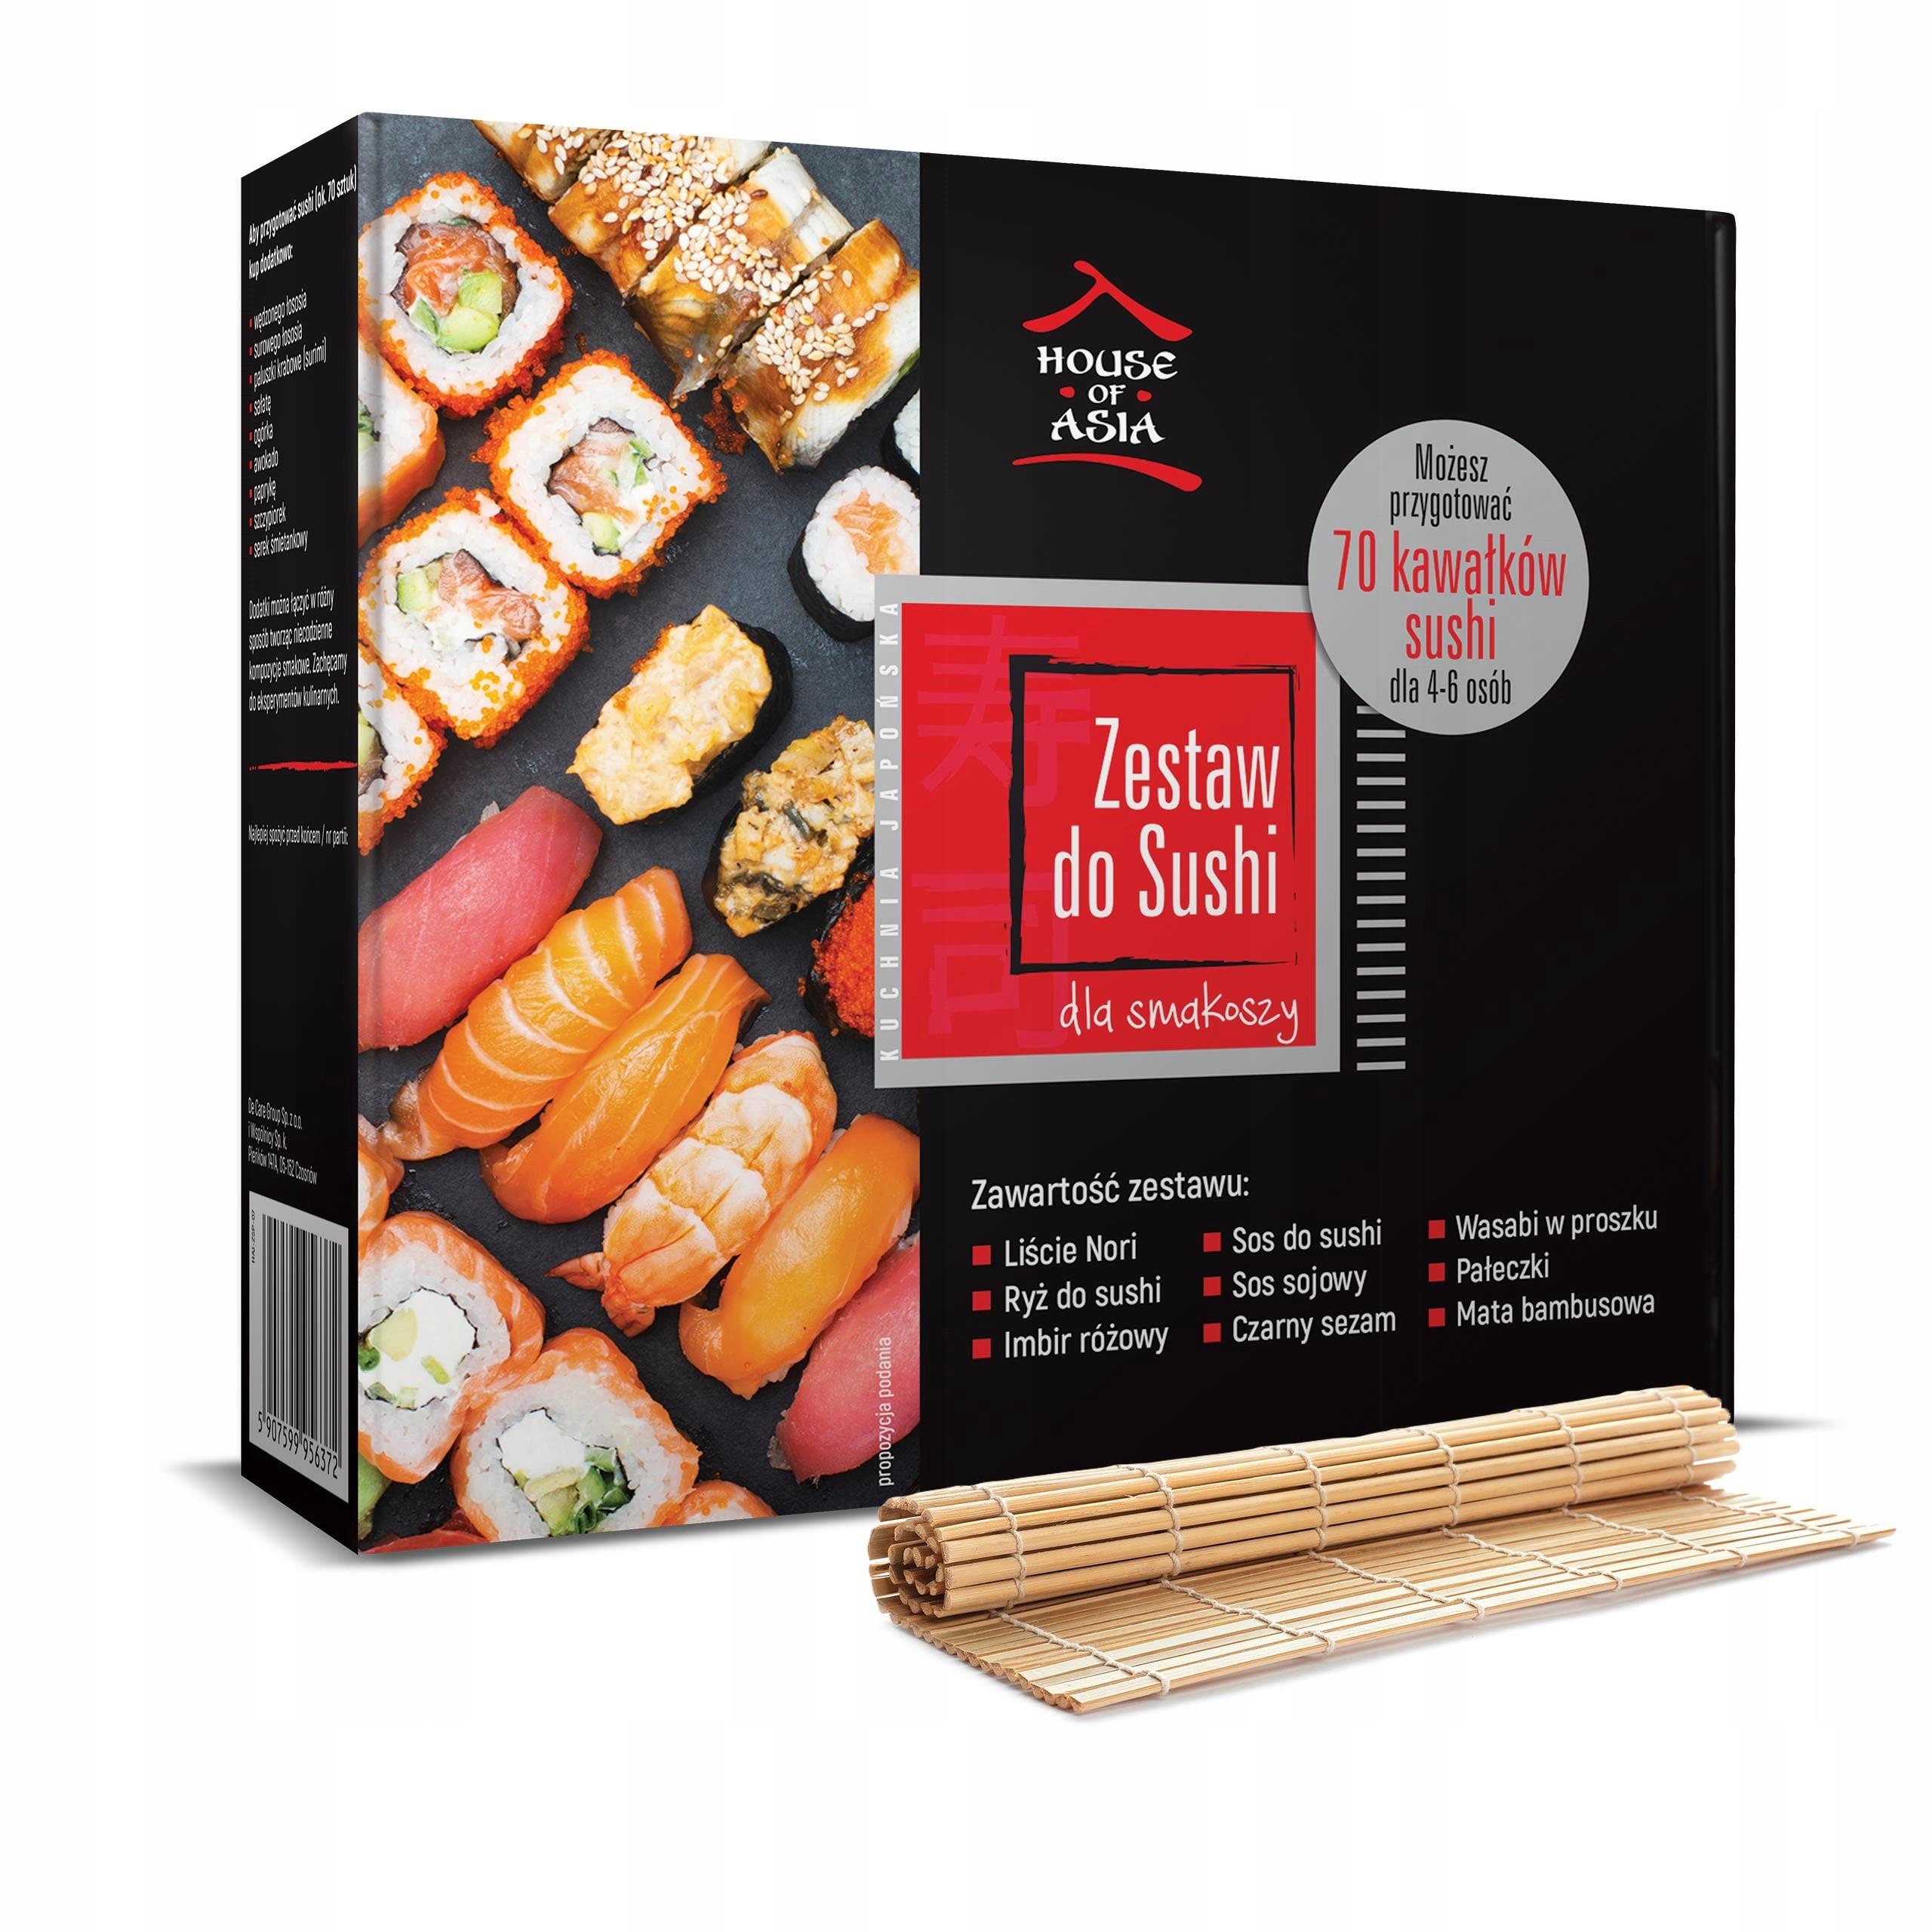 Набор суши премиум-класса на 4-6 человек 1,1 кг